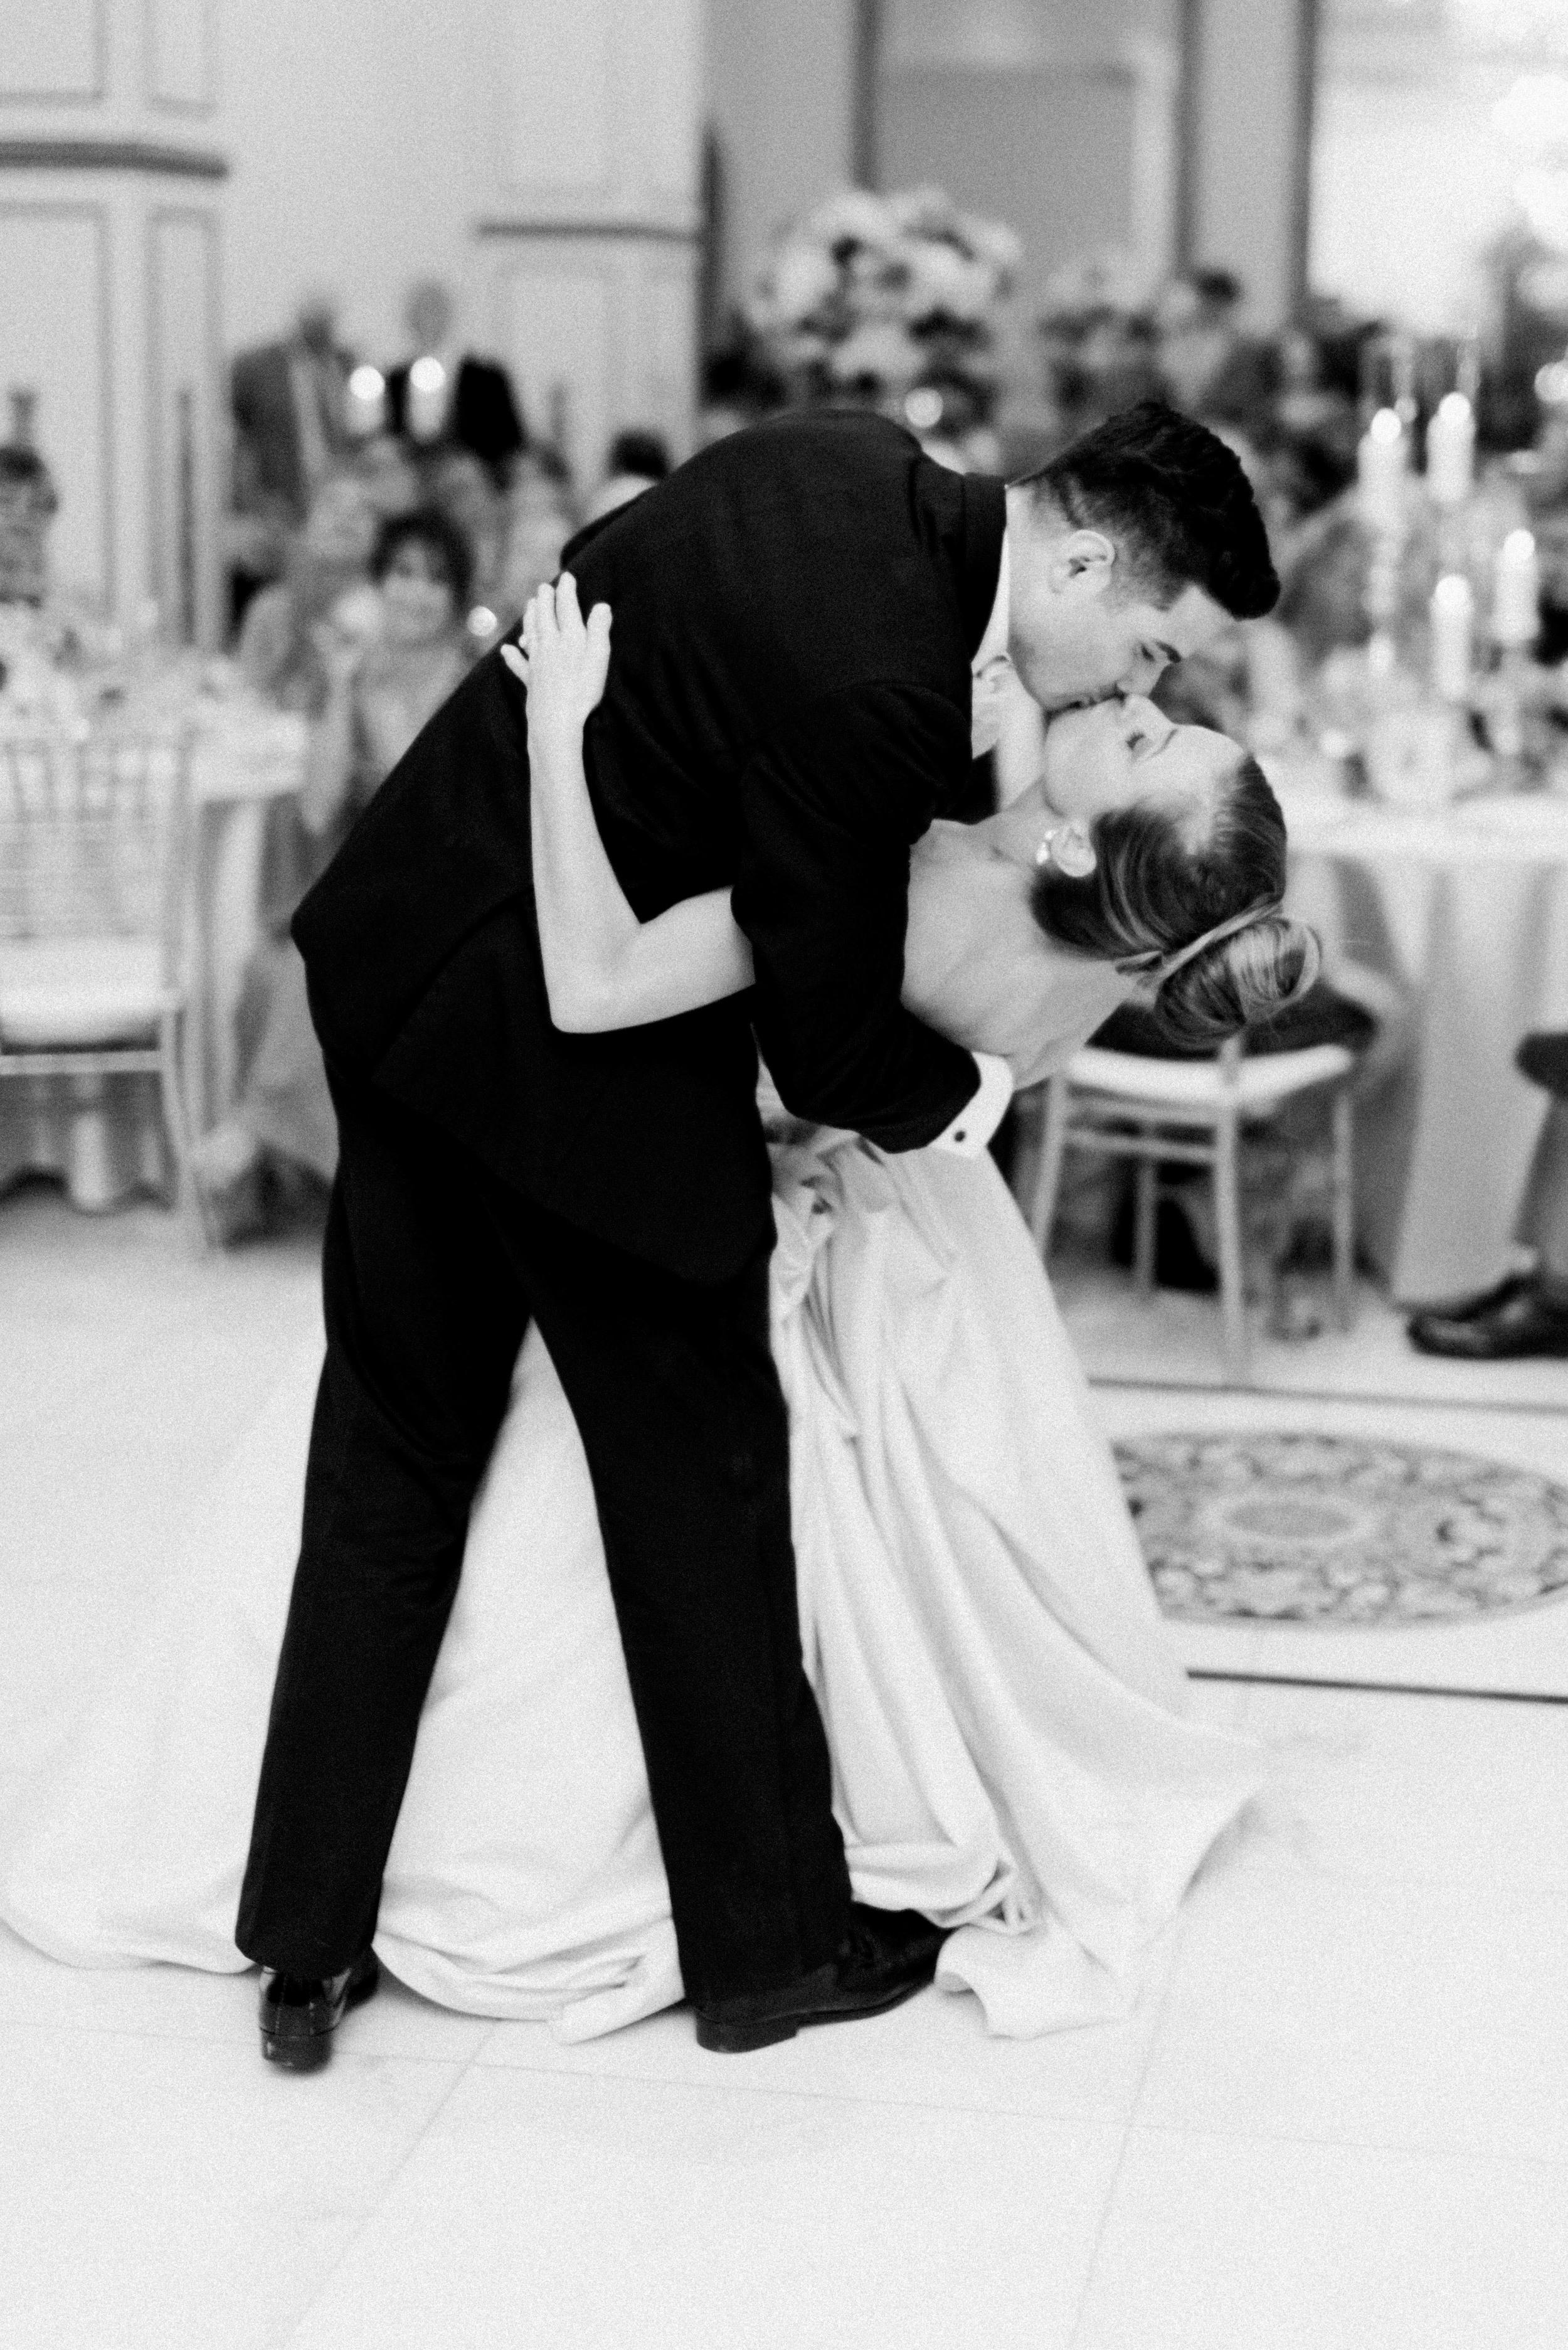 Dana-Fernandez-Photography-Houston-Wedding-Photographer-Style-Me-Pretty-Film-Texas-Destination-Photographer-44.jpg